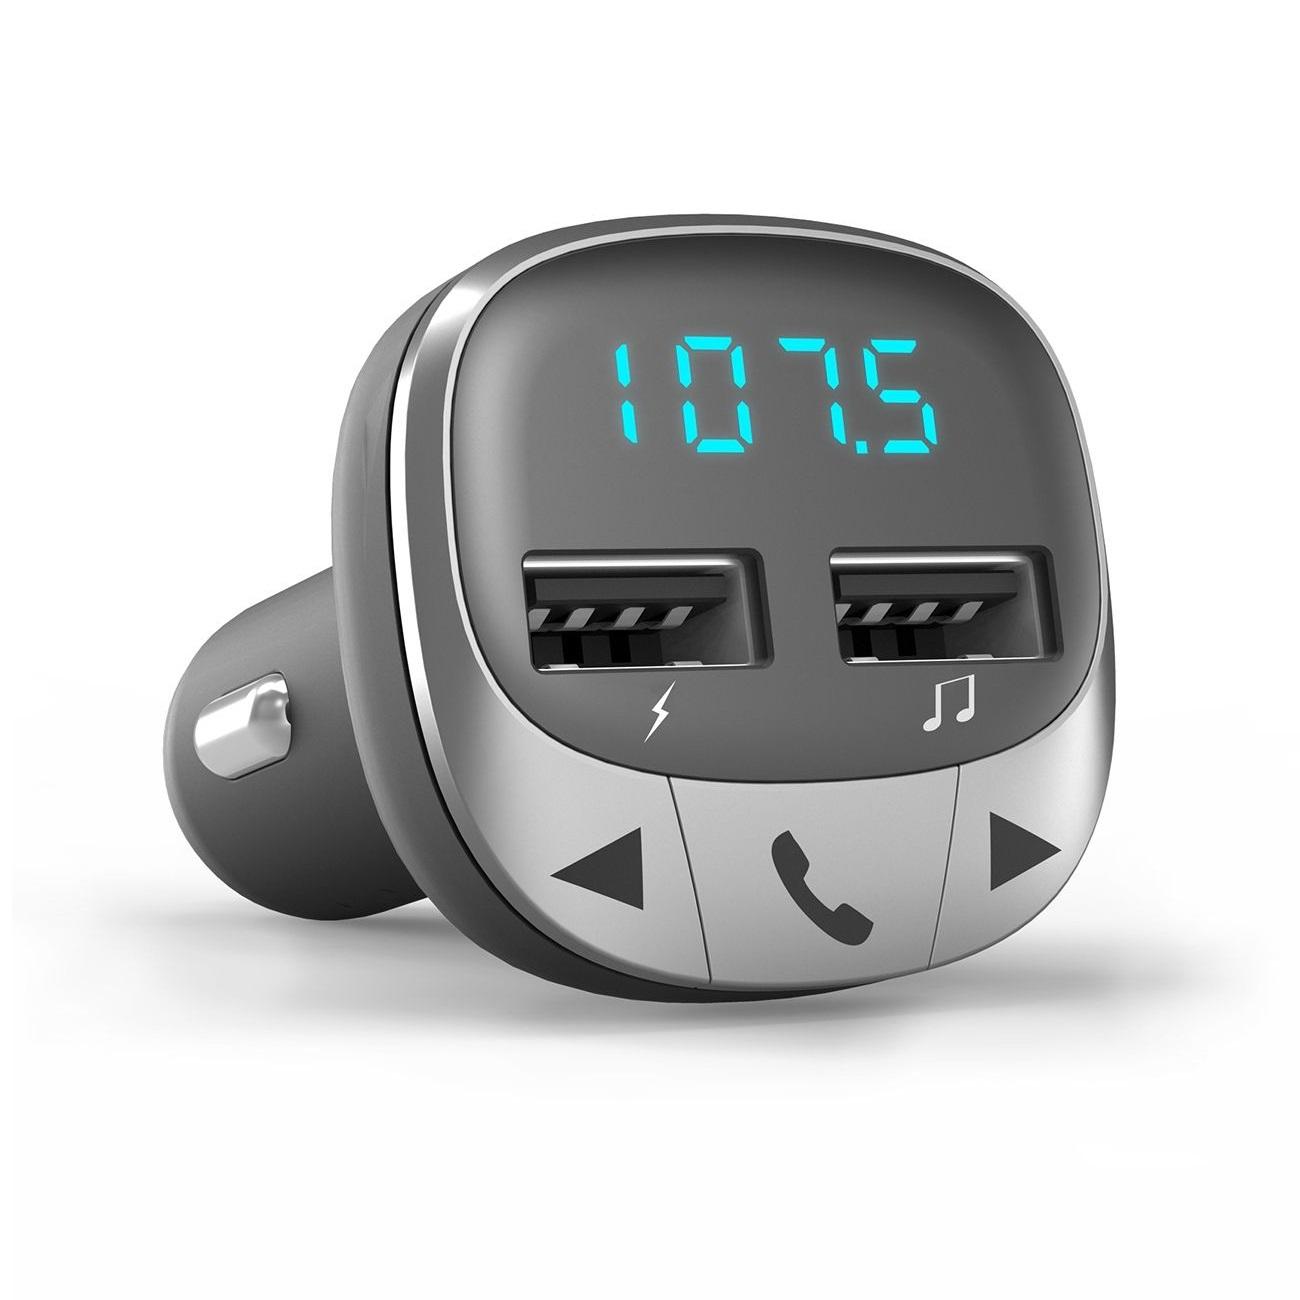 Energy Sistem 44826 transmisor FM 87,5 - 108 MHz Bluetooth Negro, Plata